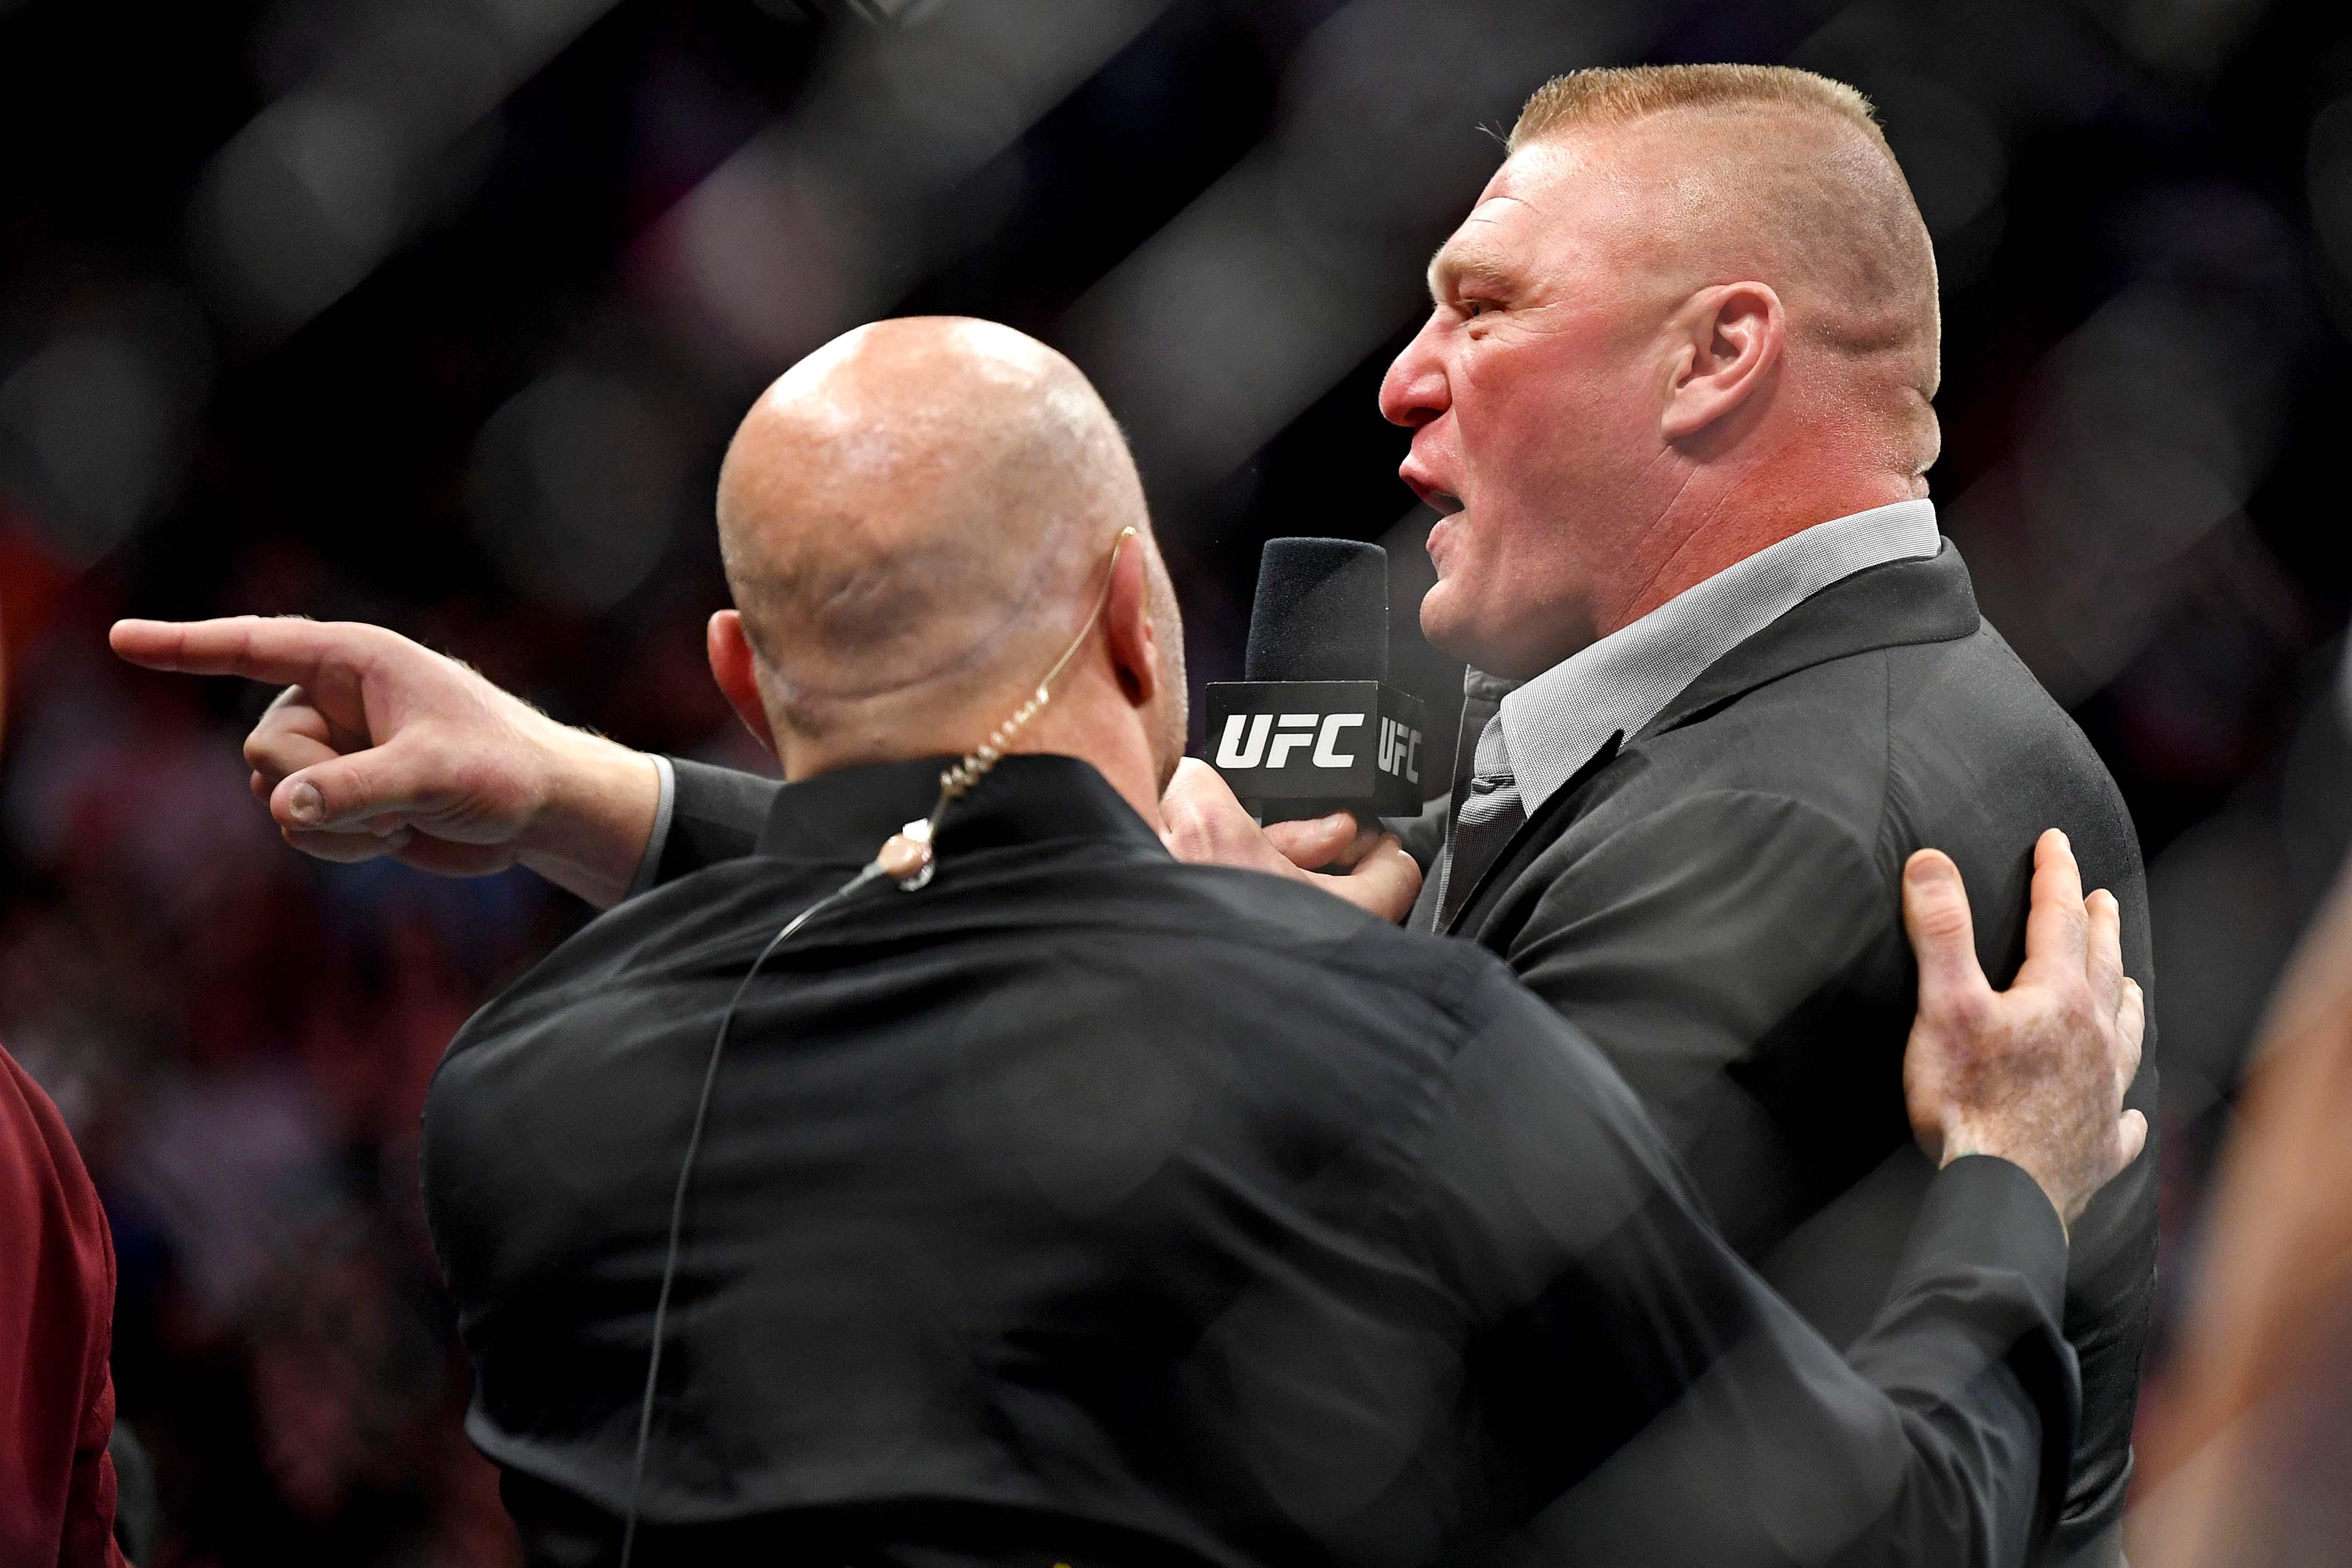 MMA: UFC 226-Miocic vs Cormier